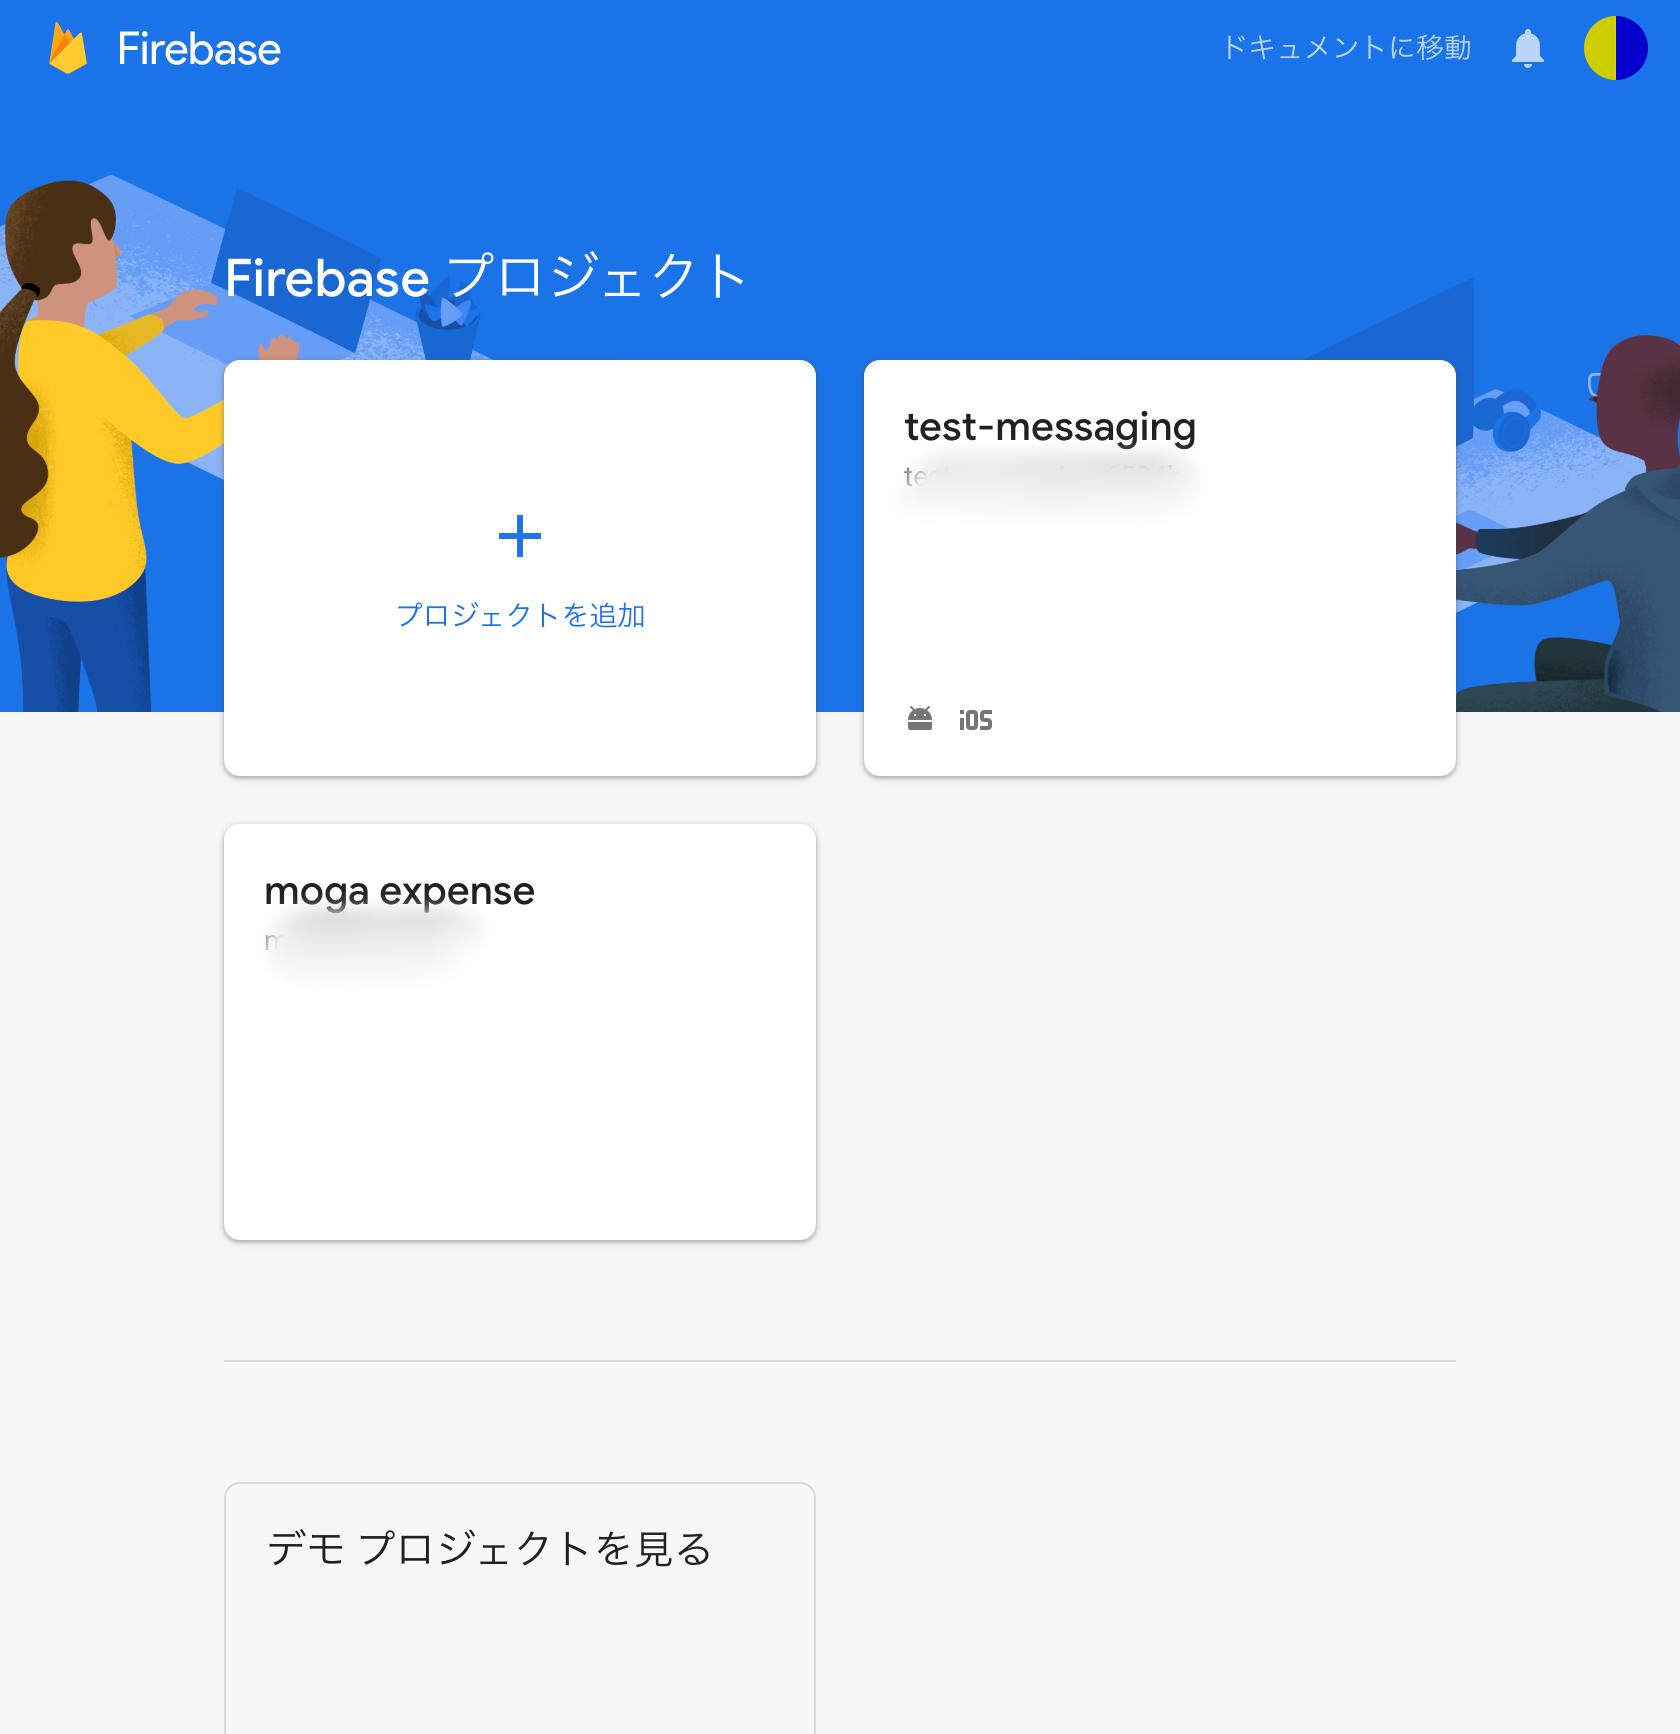 f:id:mogami74:20191207204335p:plain